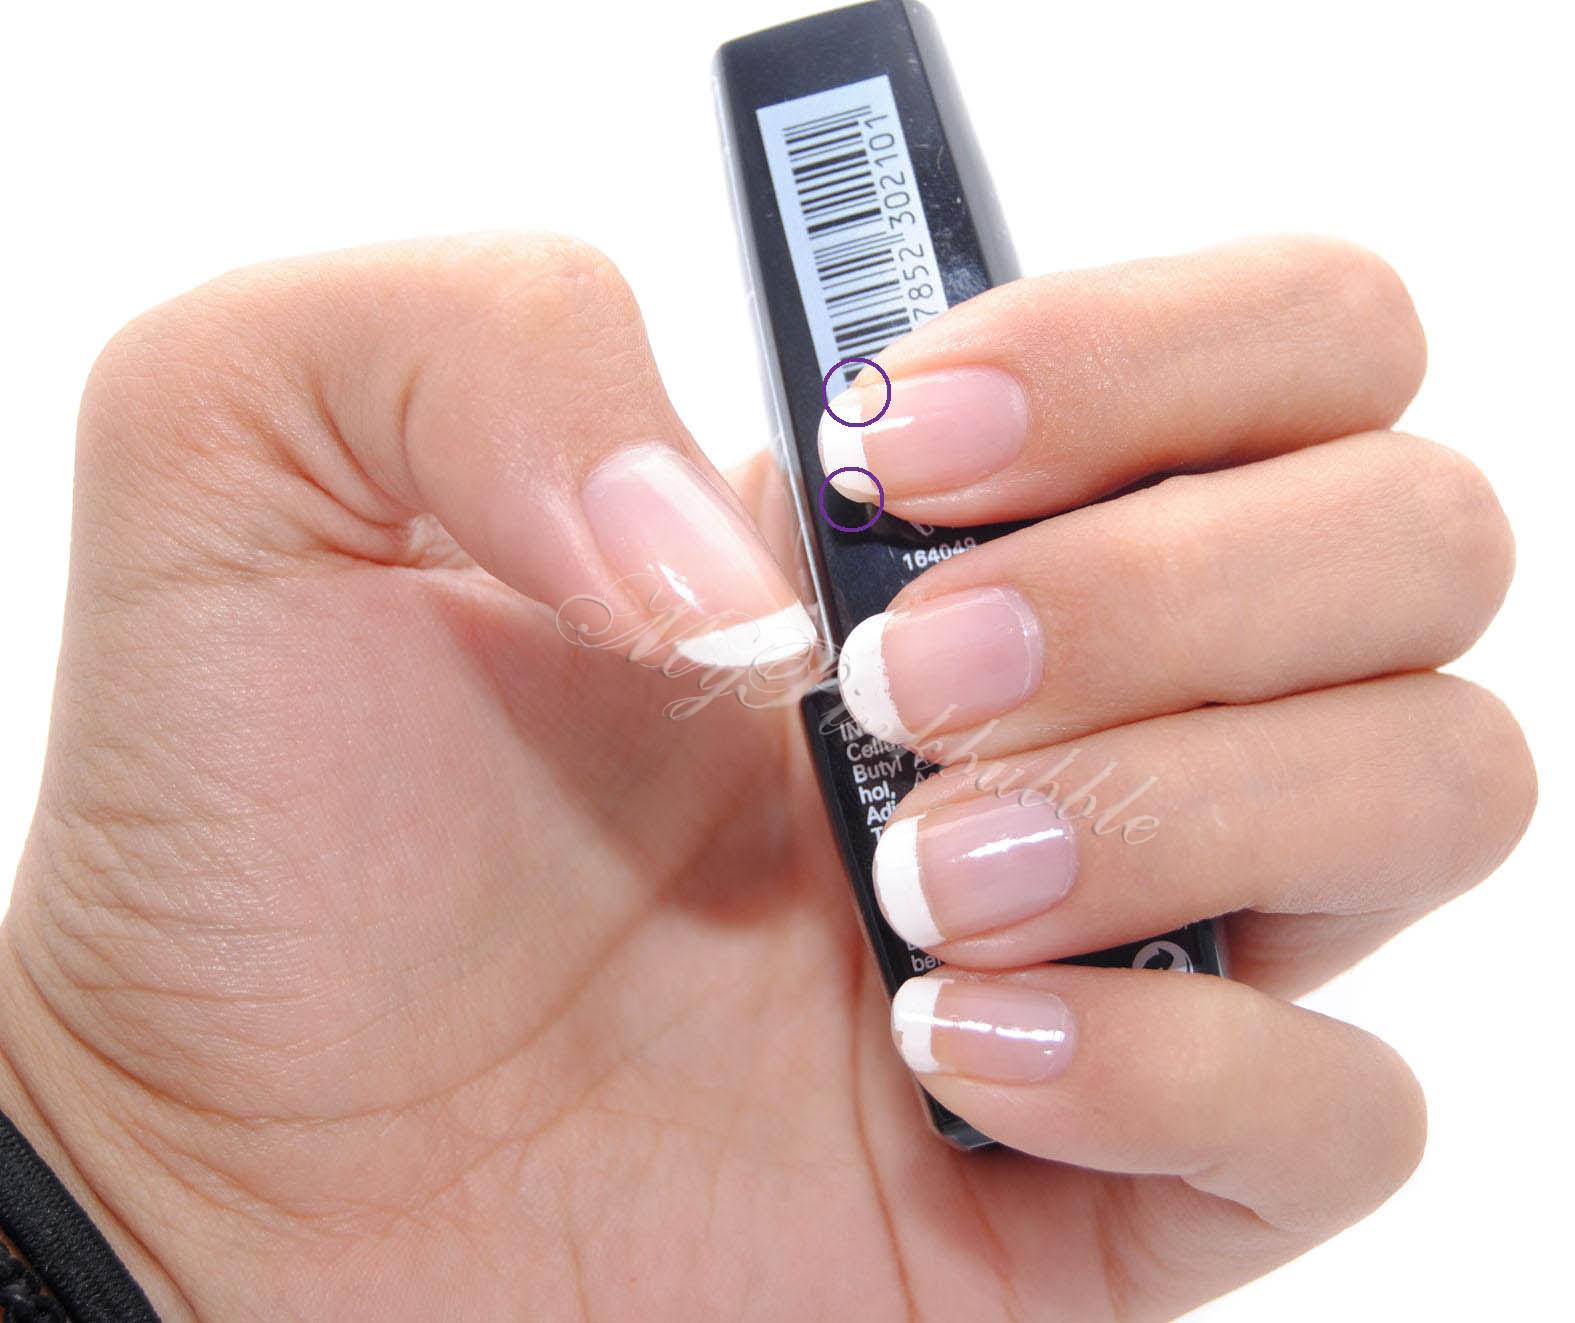 Isadora gel nail lacquer manicura 7 dias